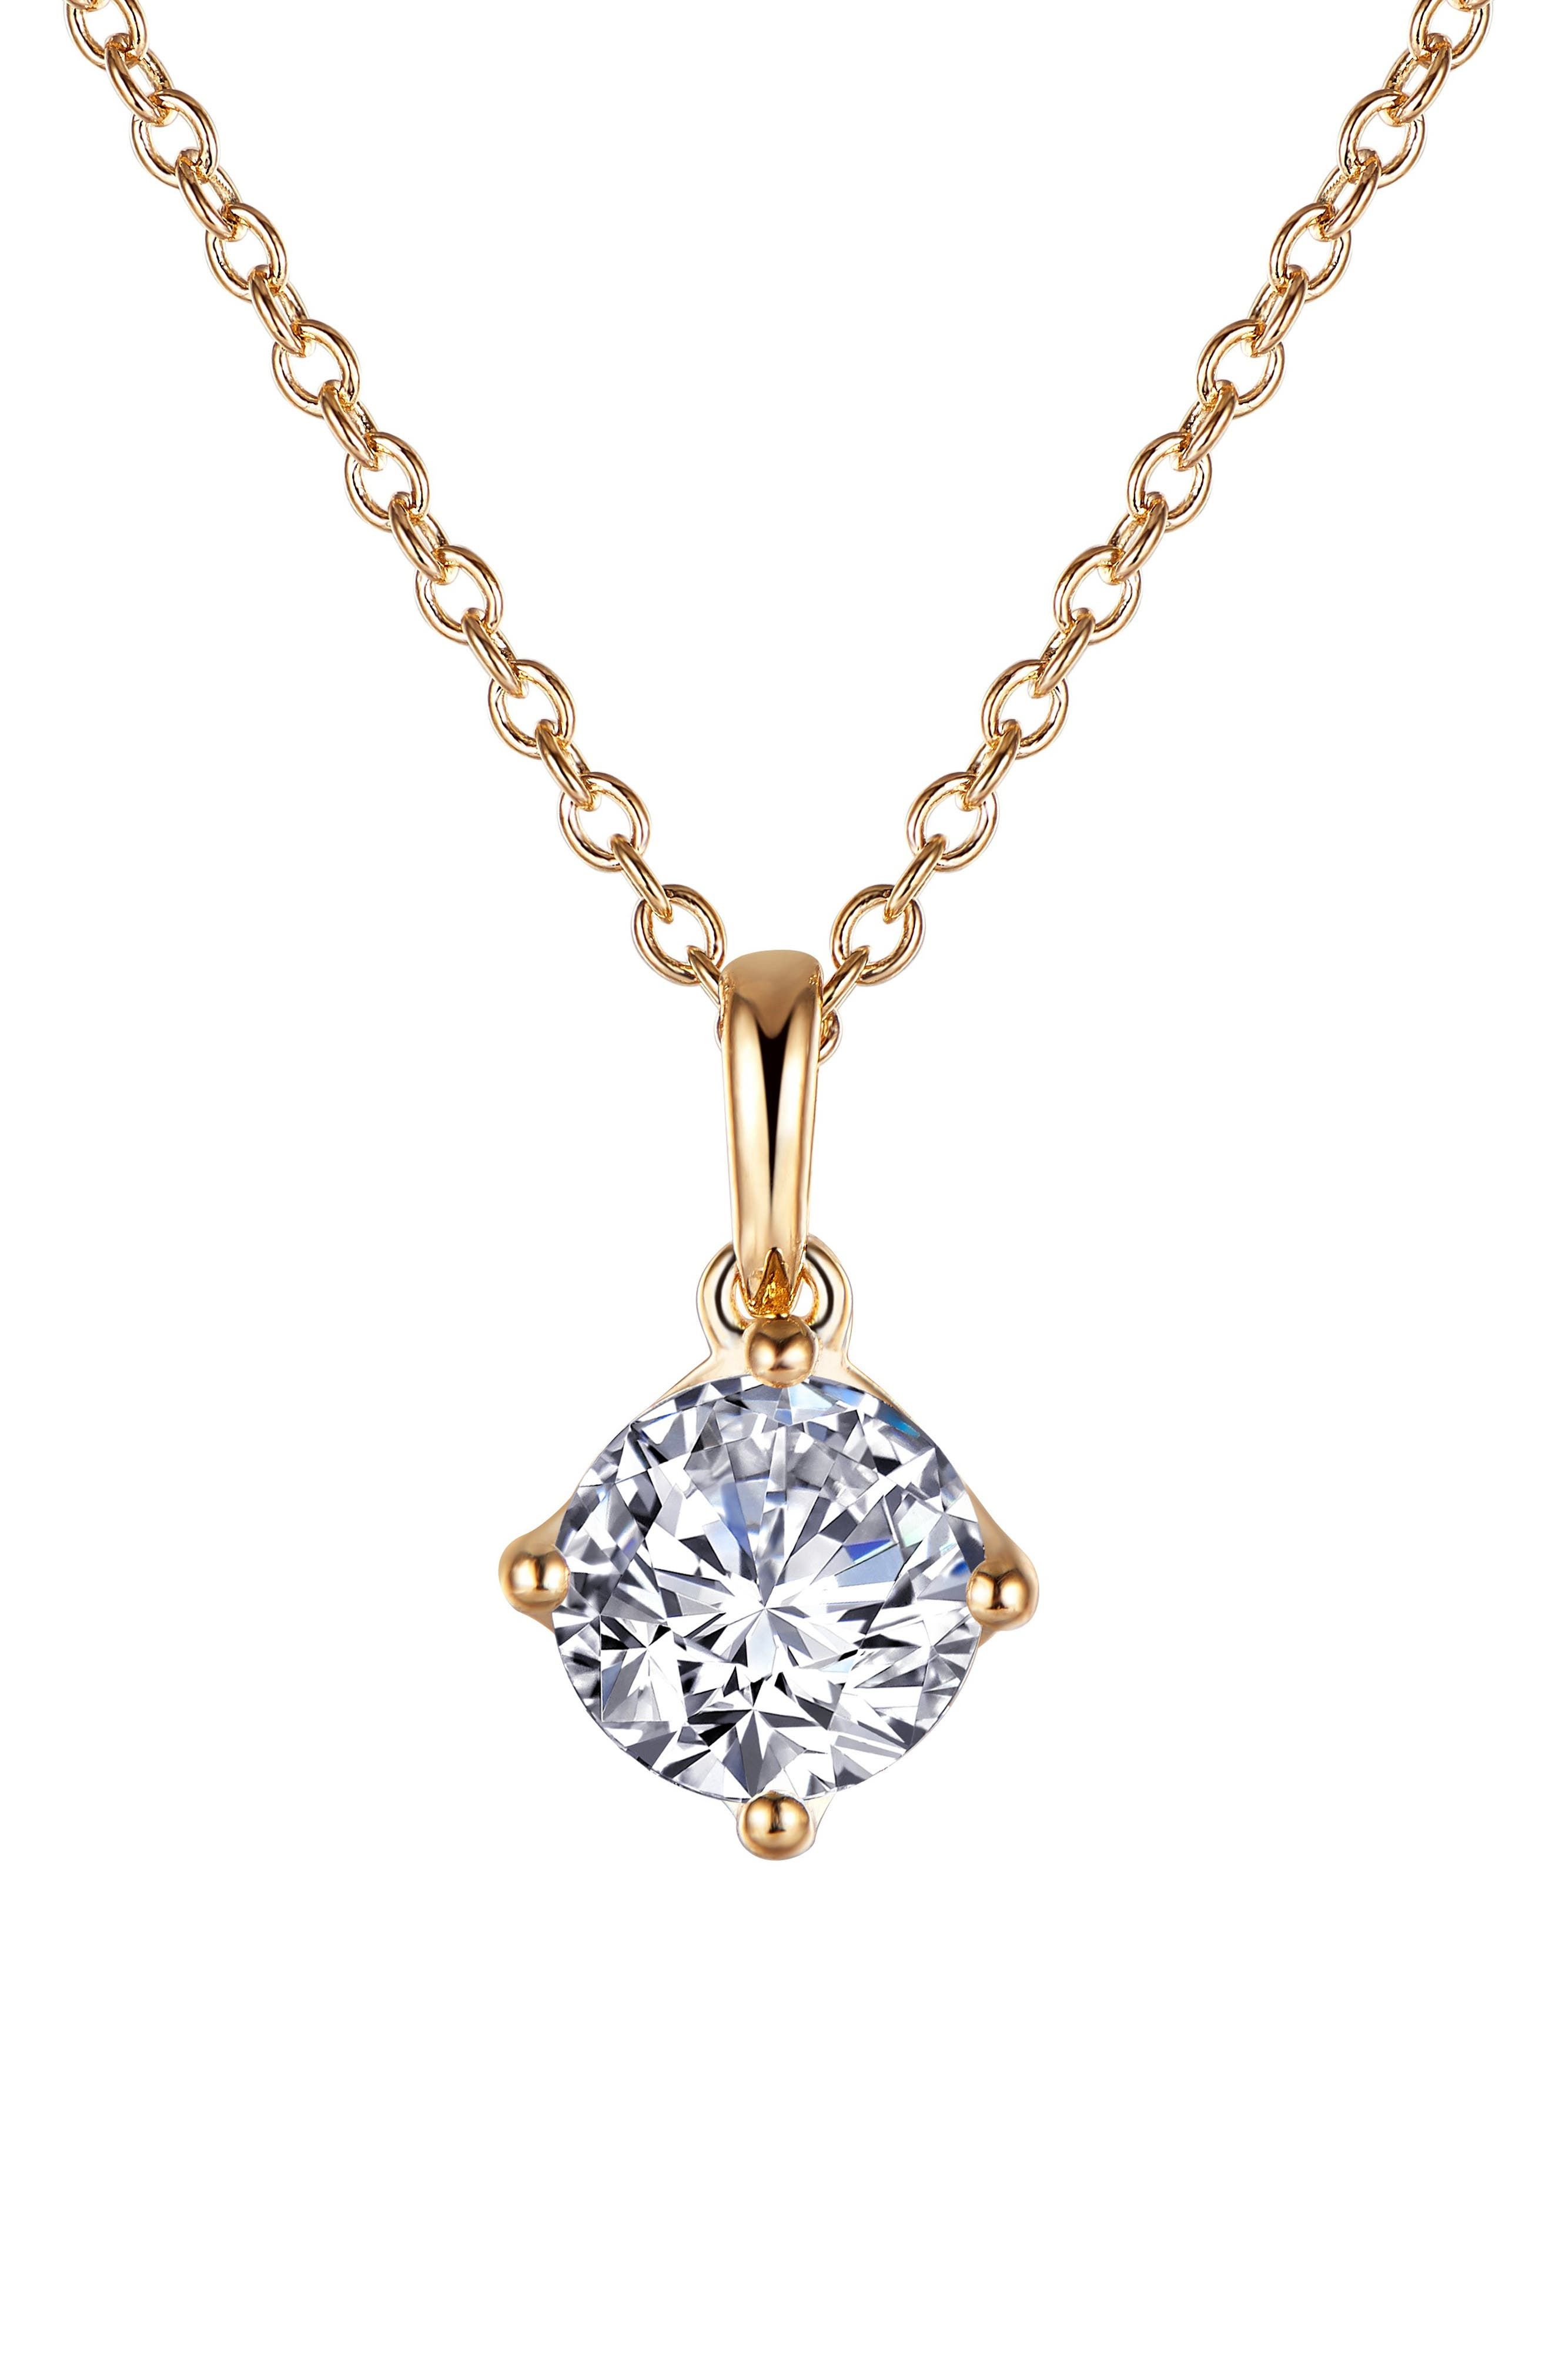 67fb0aa4f5726 Lafonn Women's Jewelry